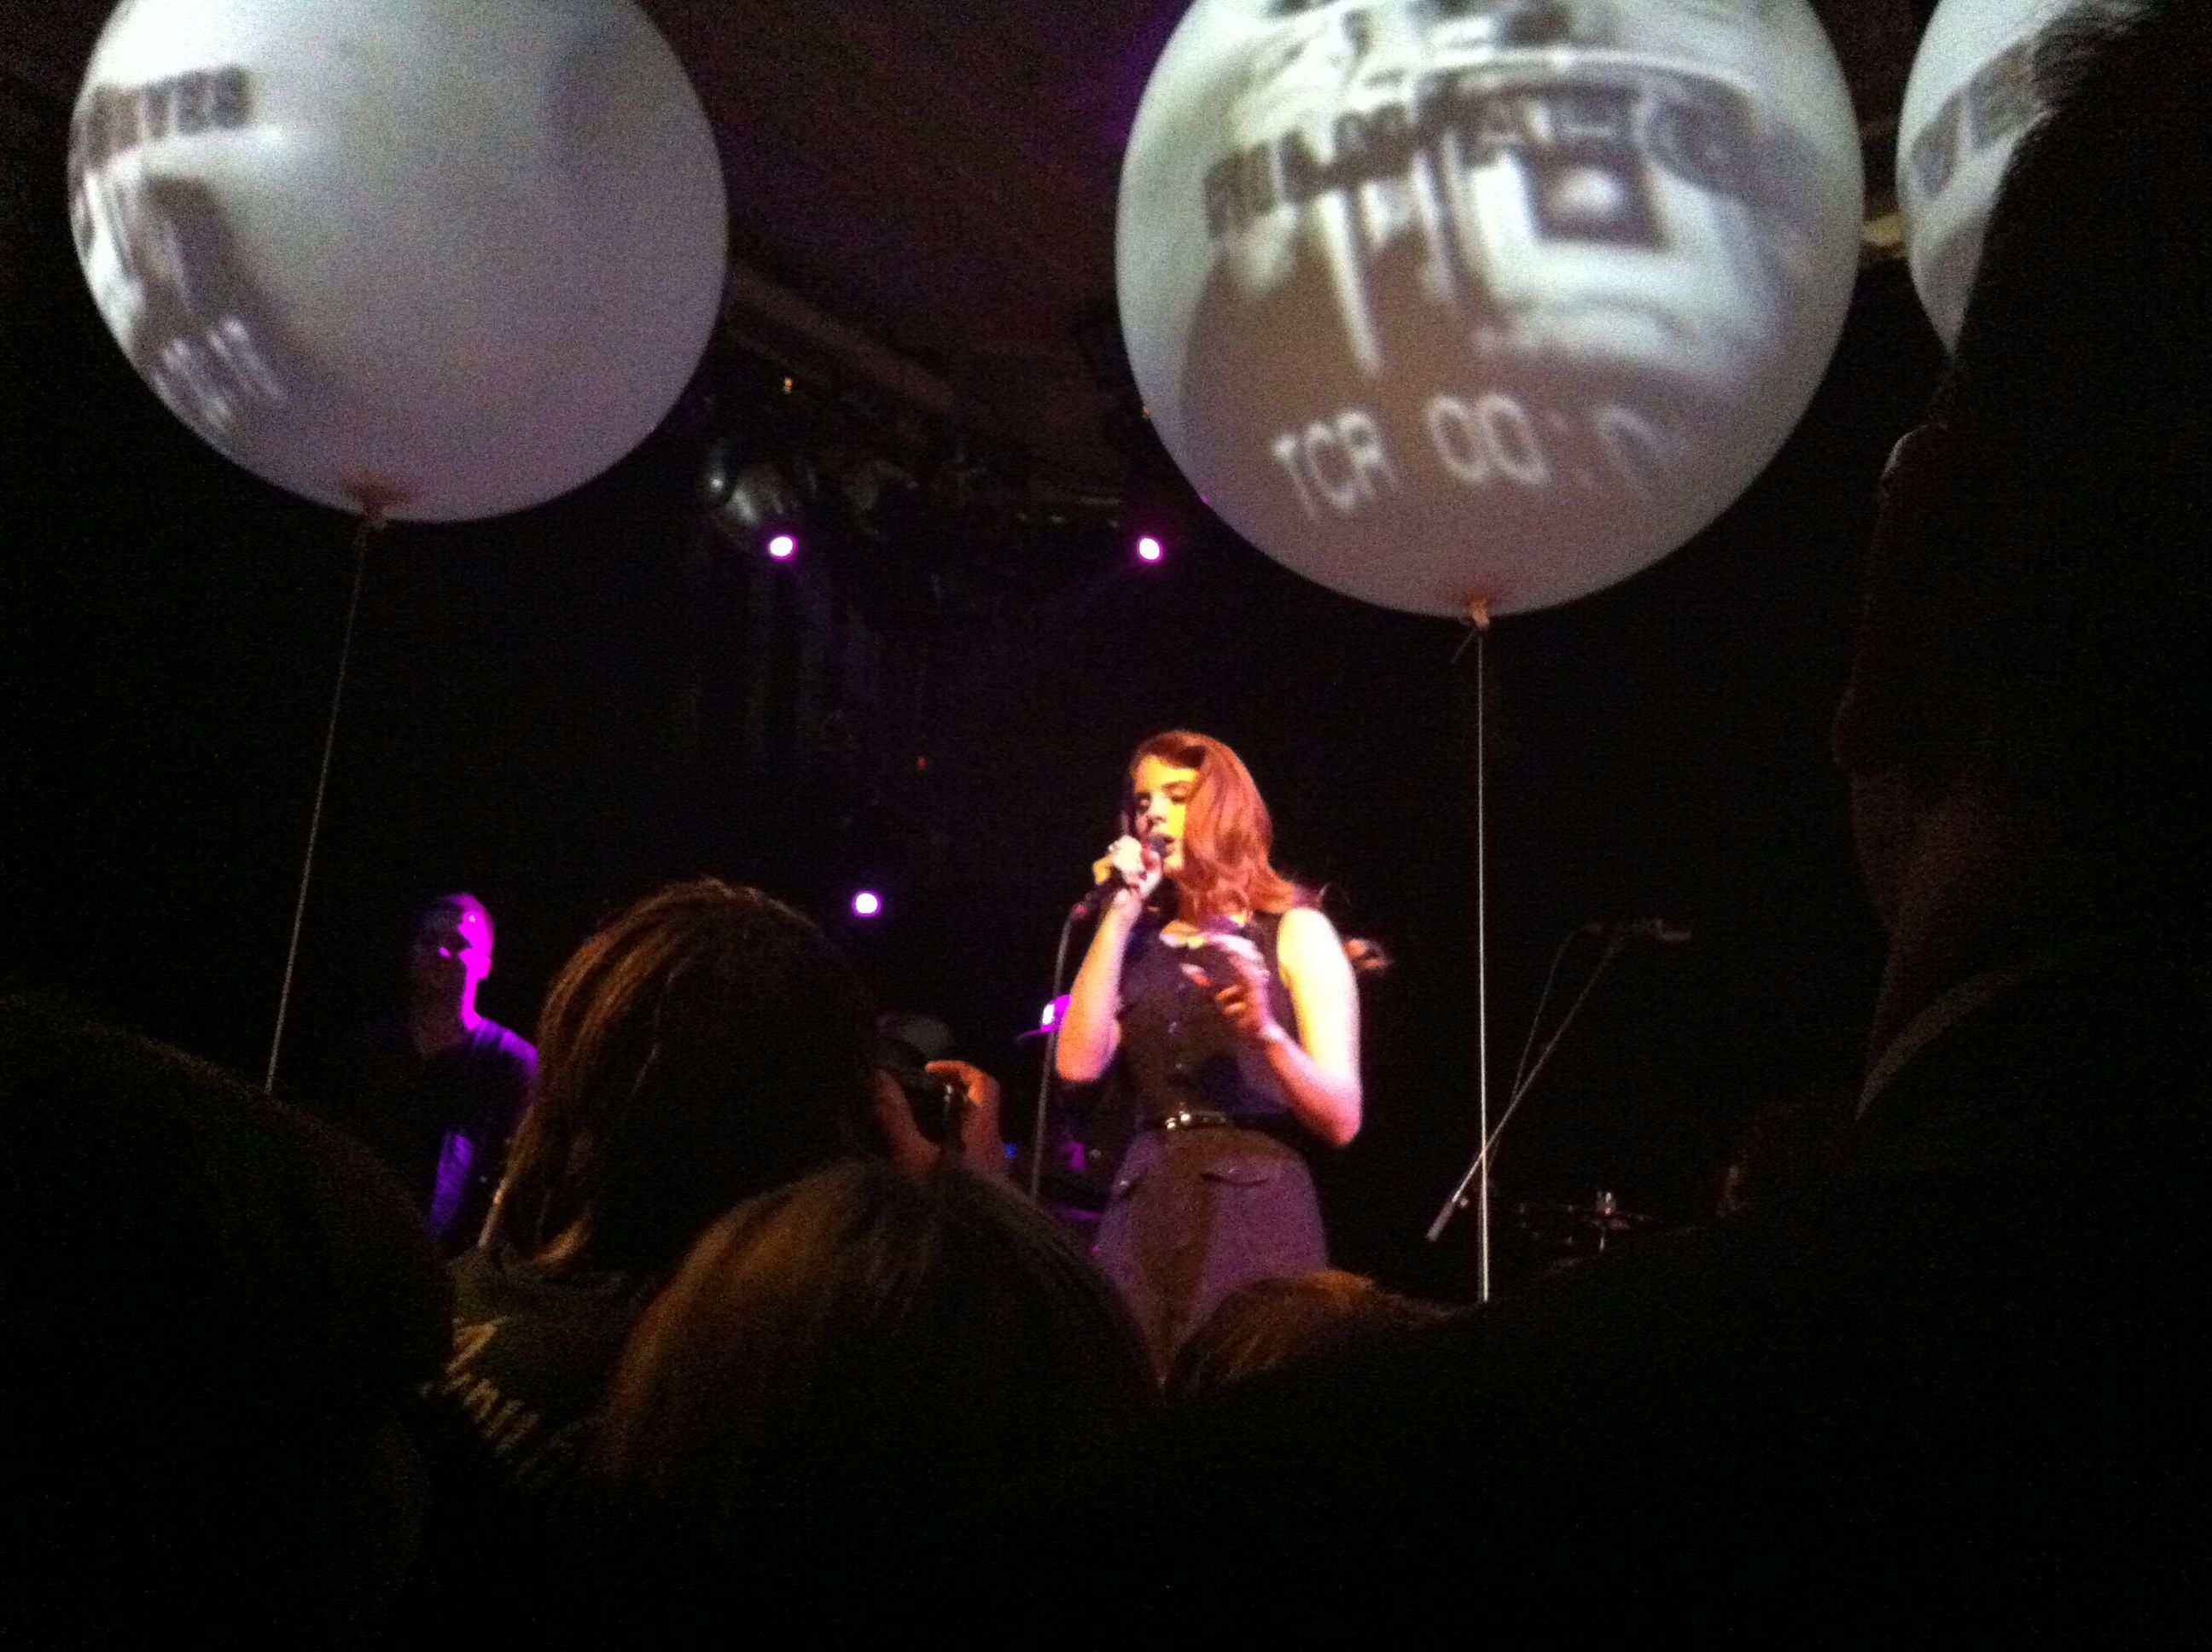 Lana Del Rey a interprété Heart Shaped Box de Nirvana à Sidney